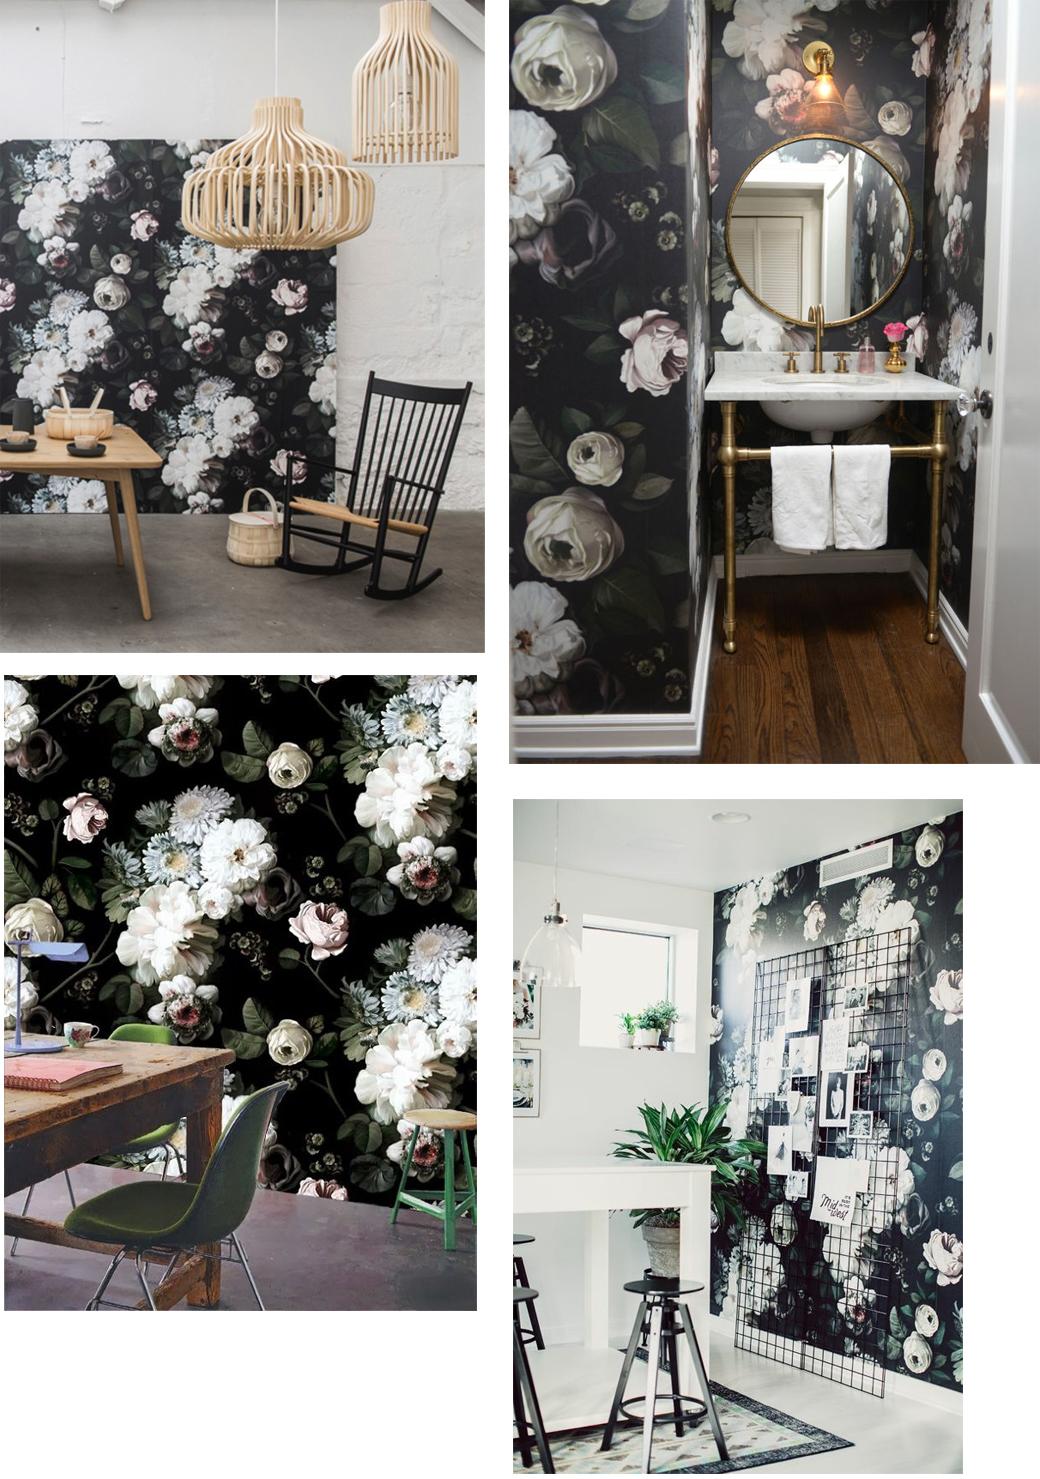 Black floral print wallpaper dark floral wallpaper by ellie cashman - Top L Ellie Cashman Top R Cupcakes And Cashmere Bottom L Ellie Cashman Bottom R Pinterest